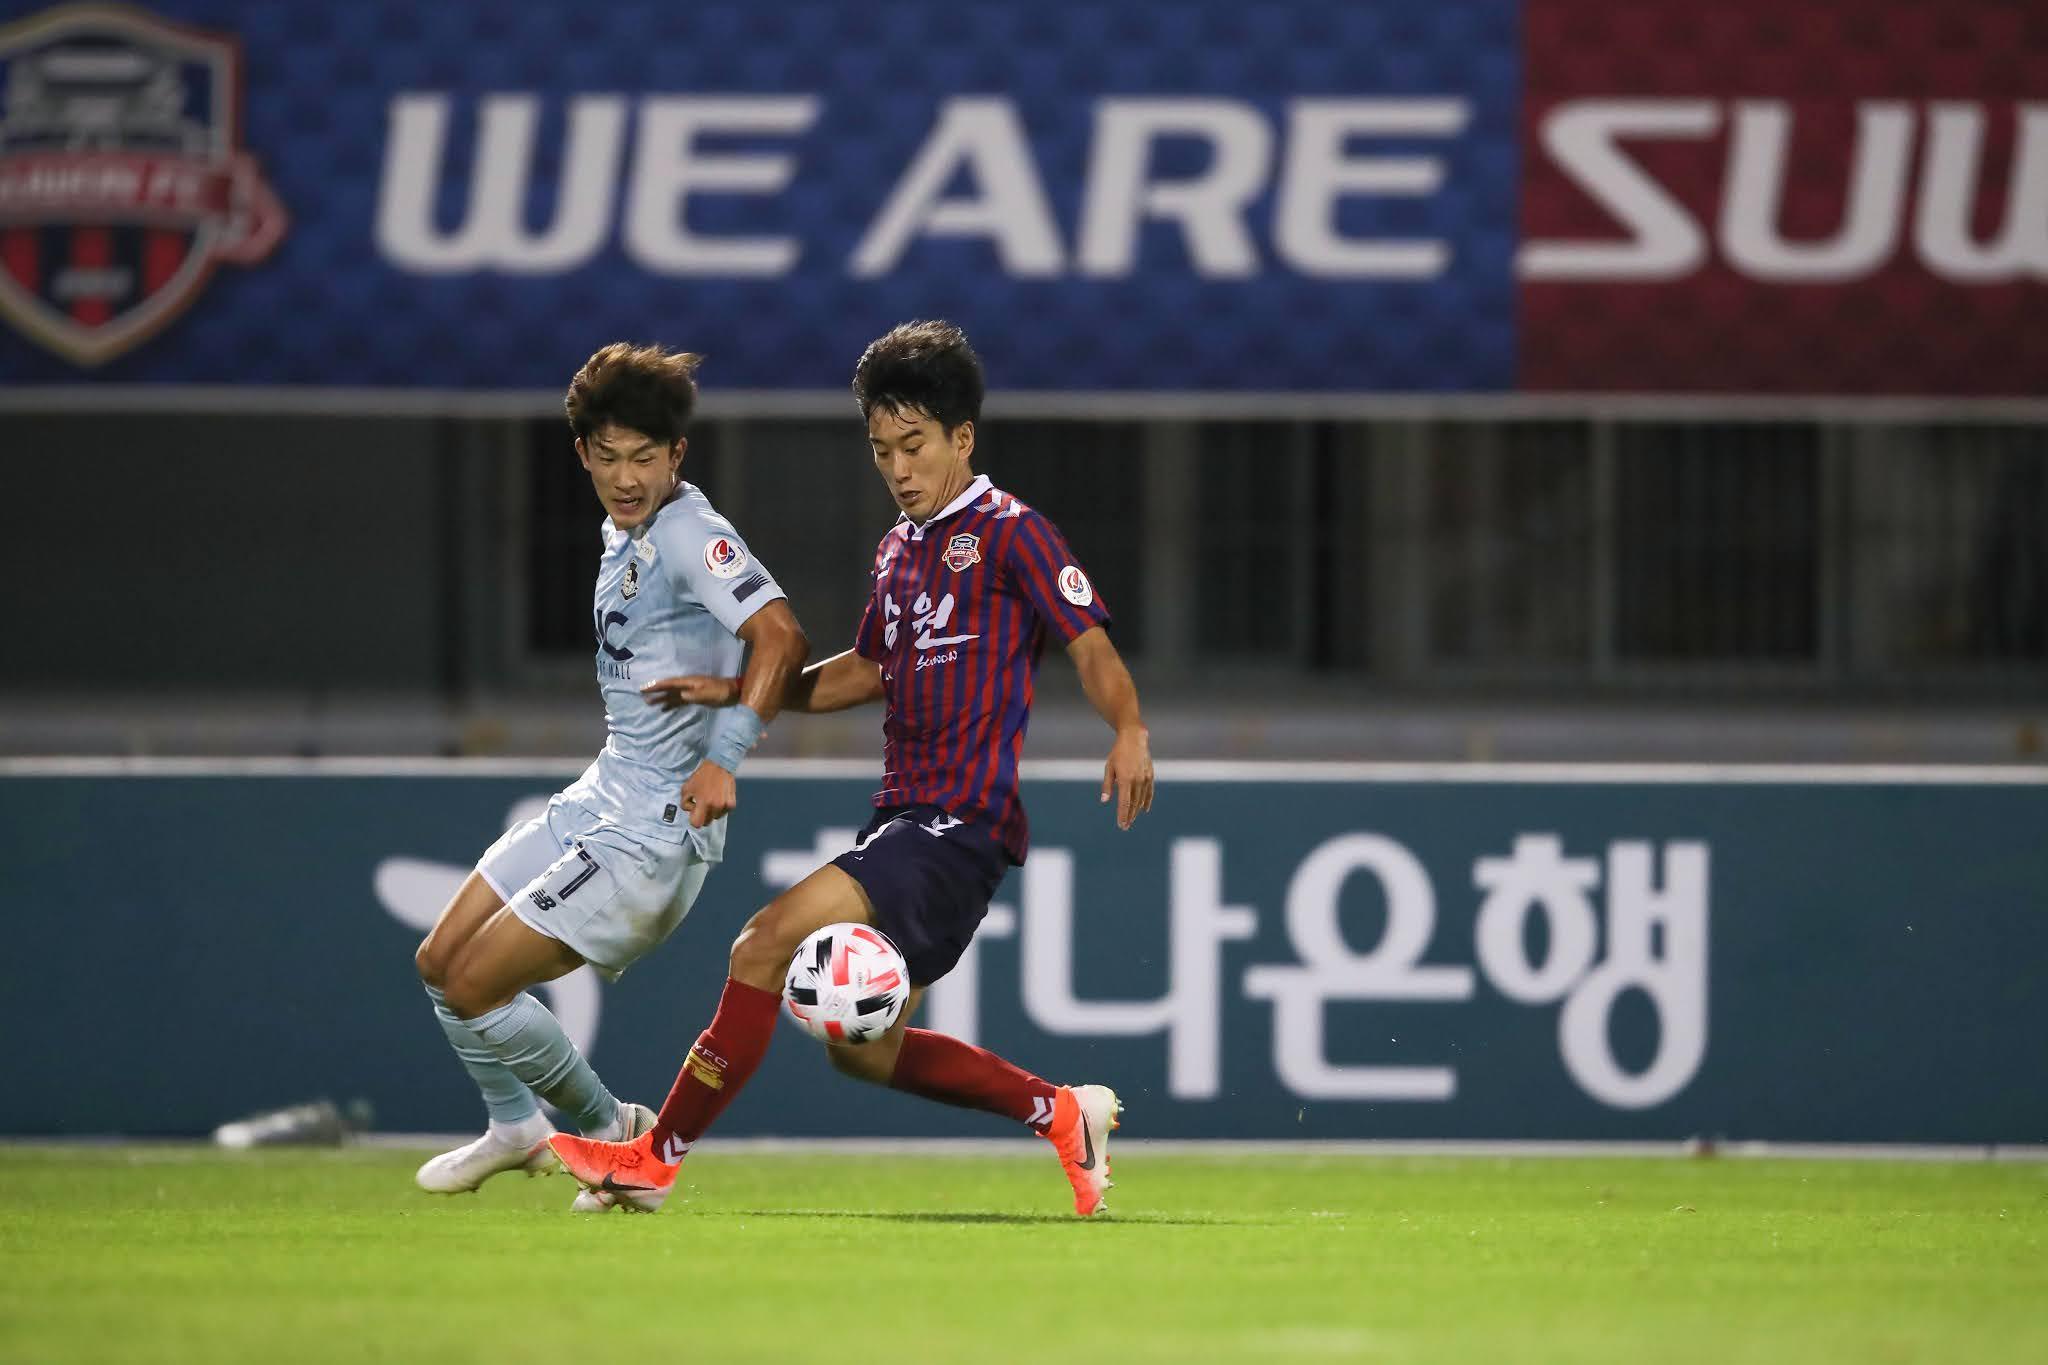 Park Min-kyu